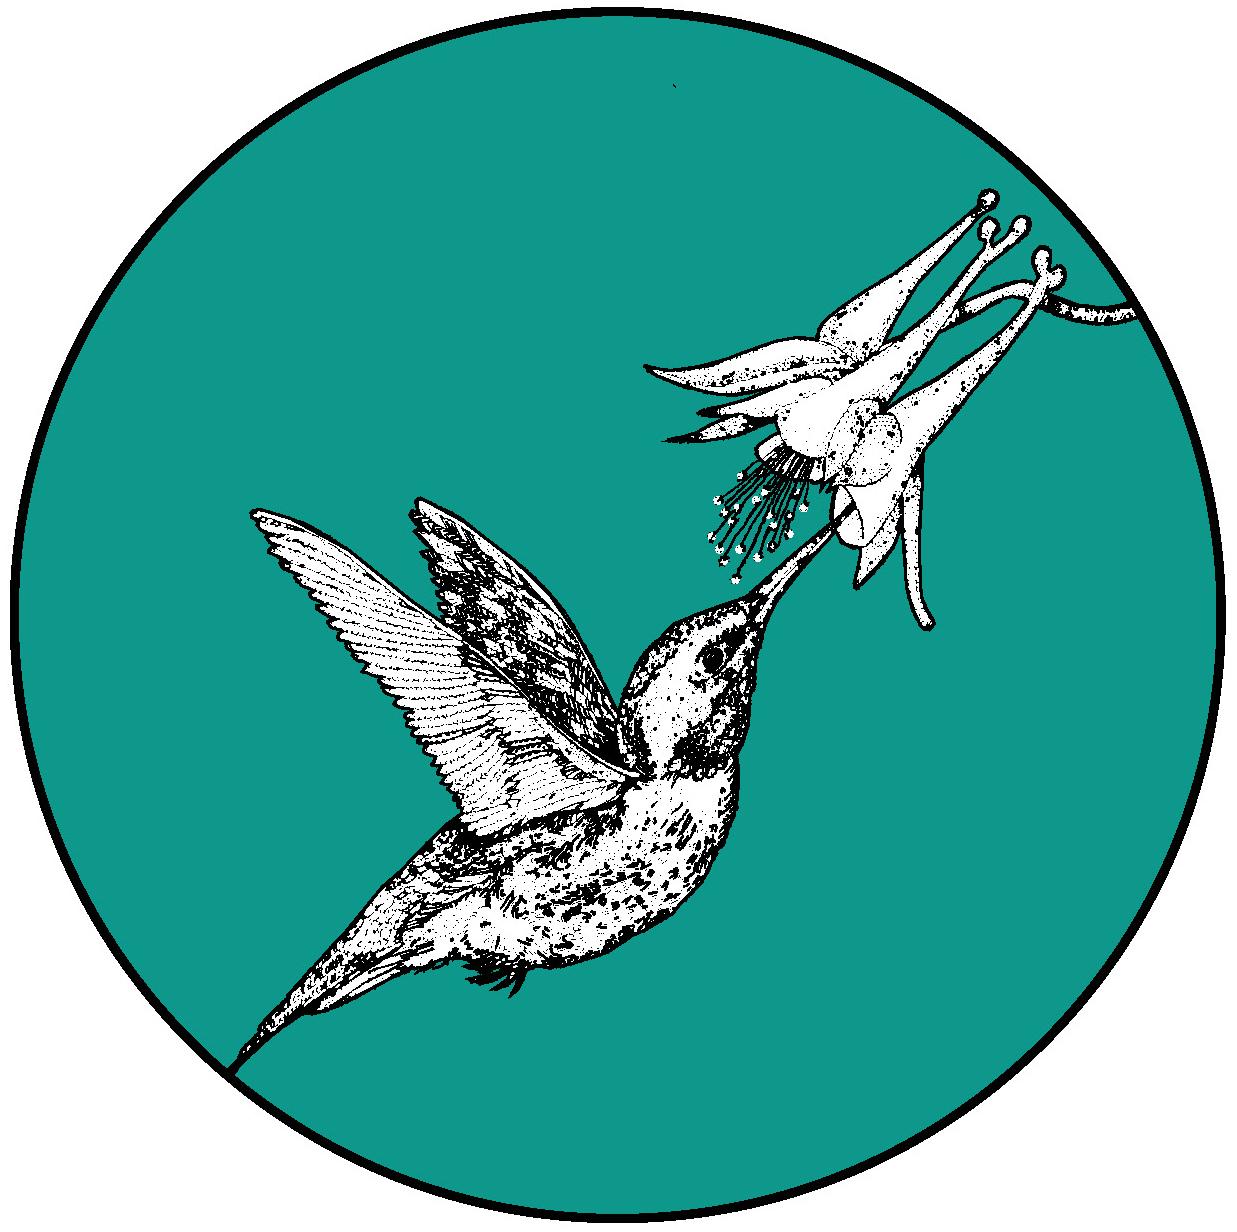 Hummingbird_FINAL copy.jpg